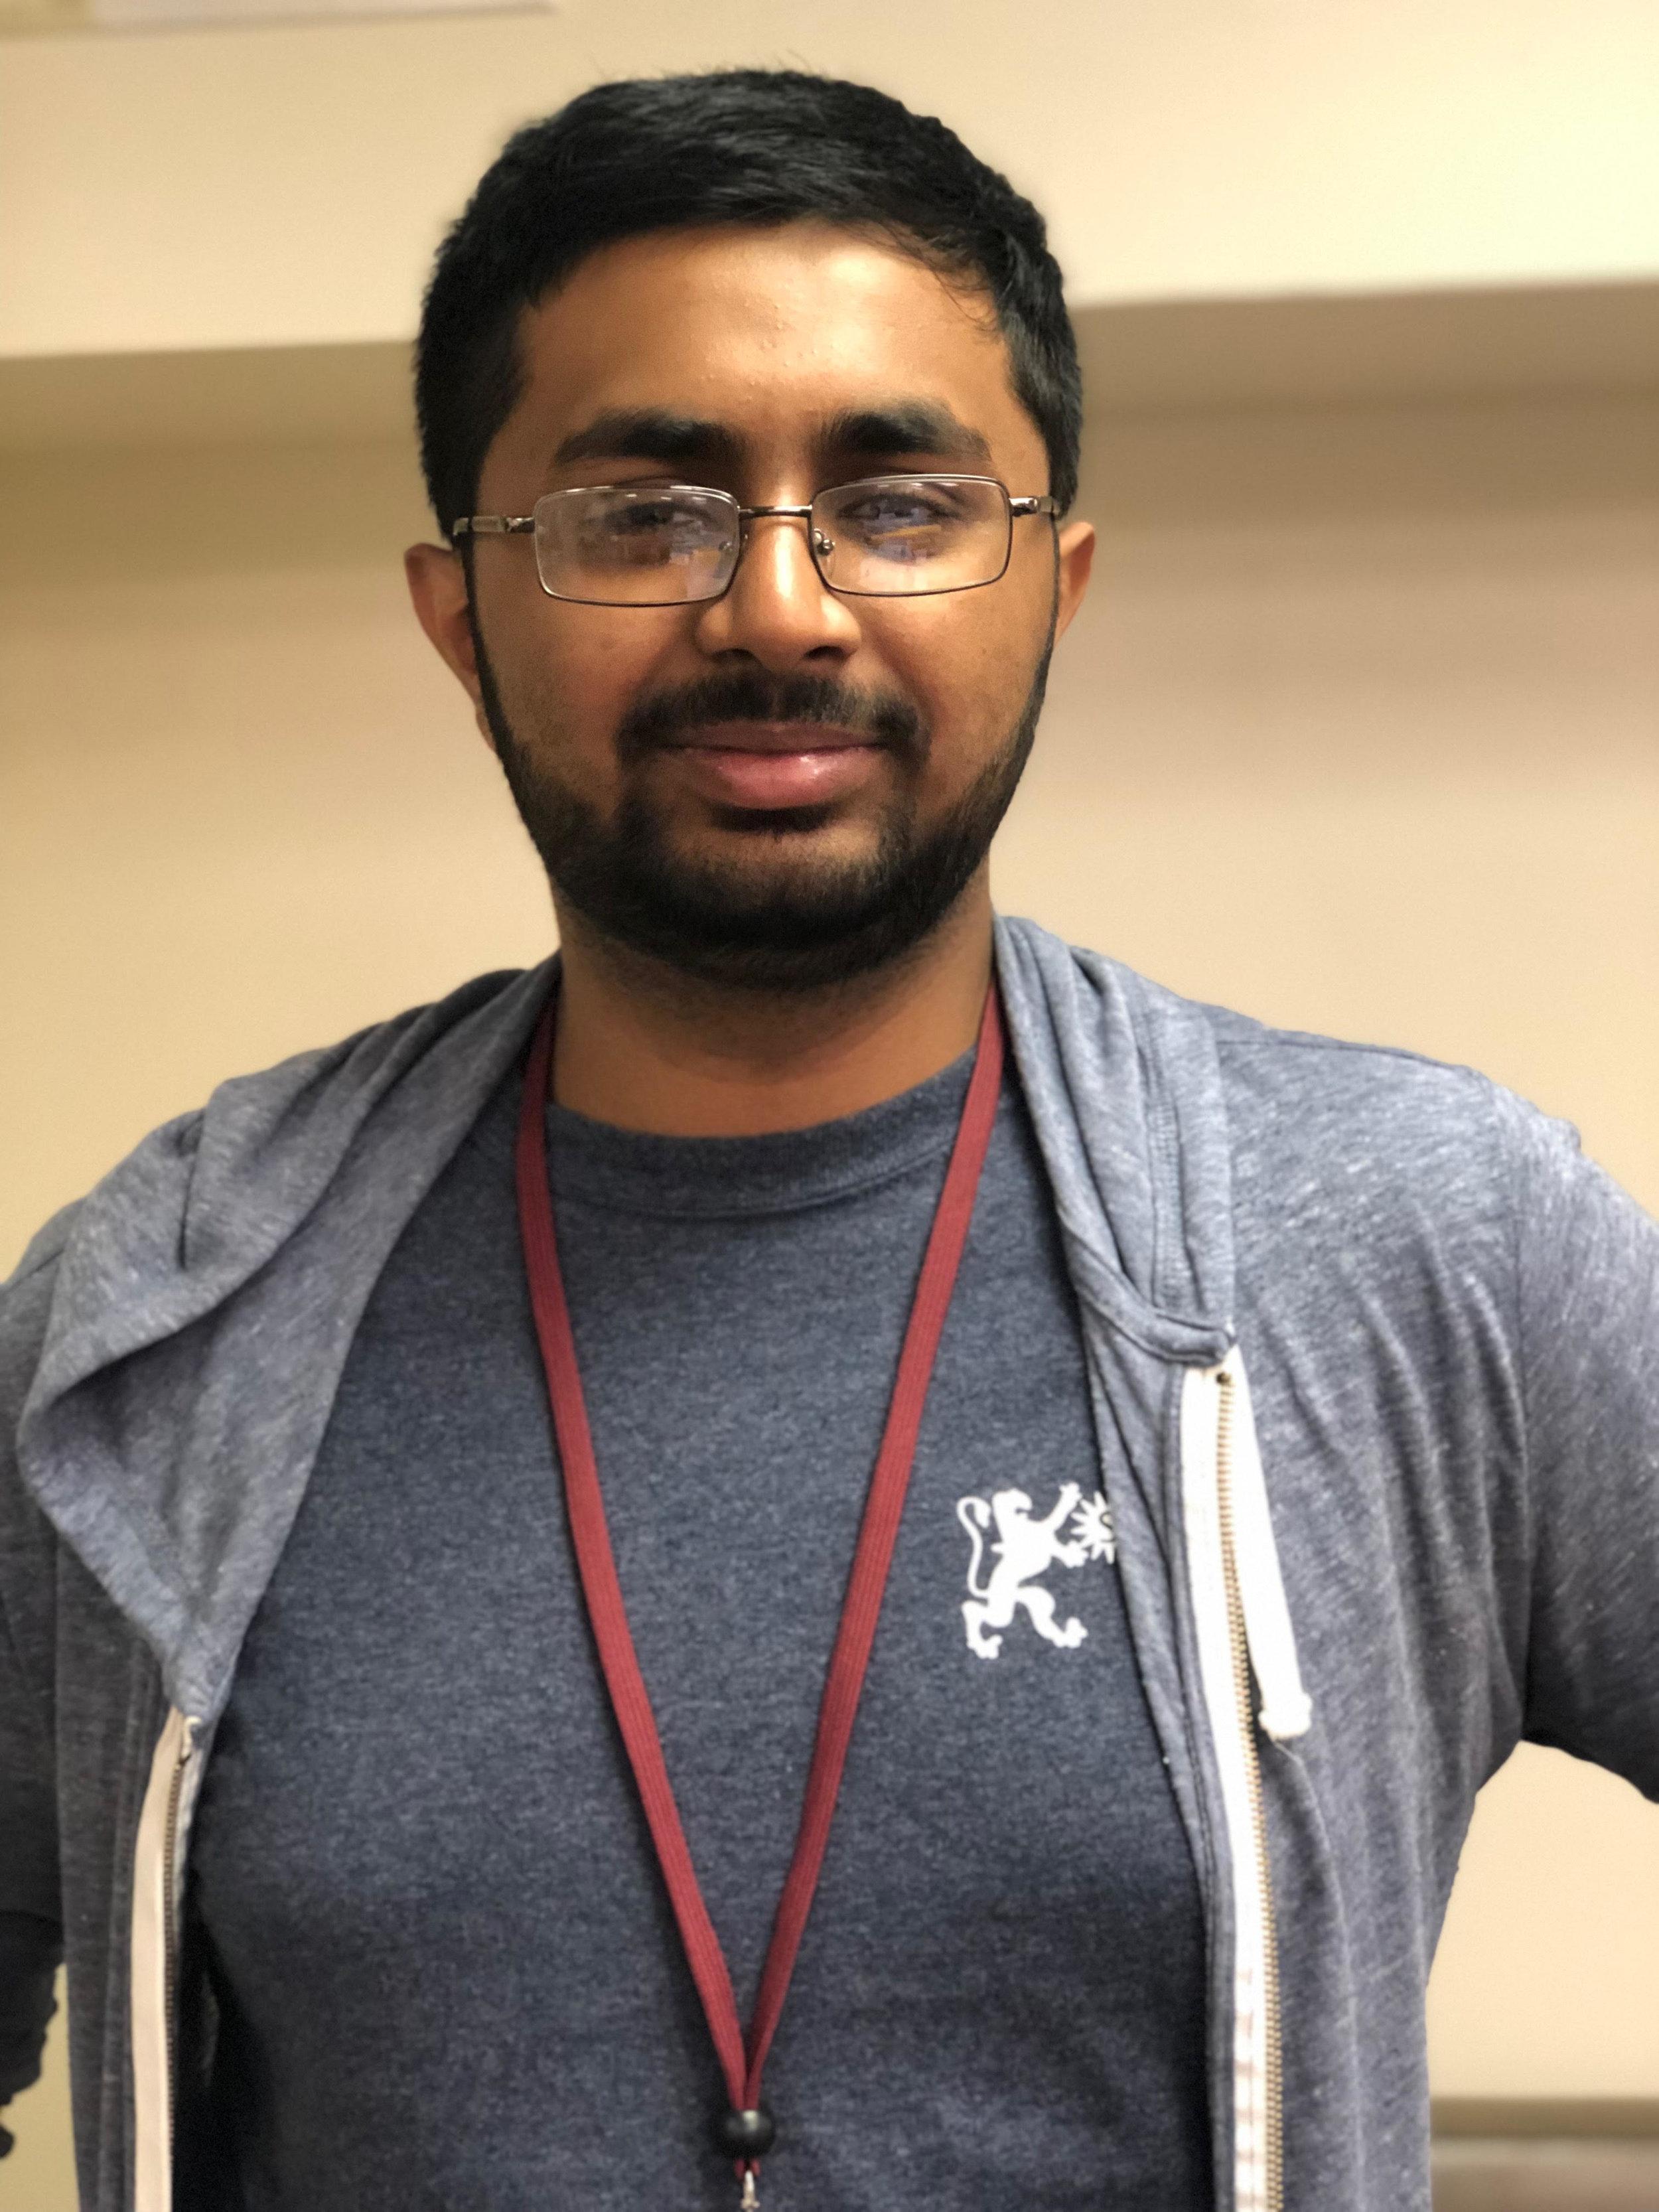 Abdullah Abid - Assistant Teacher/College Intern at Summer on the Hill